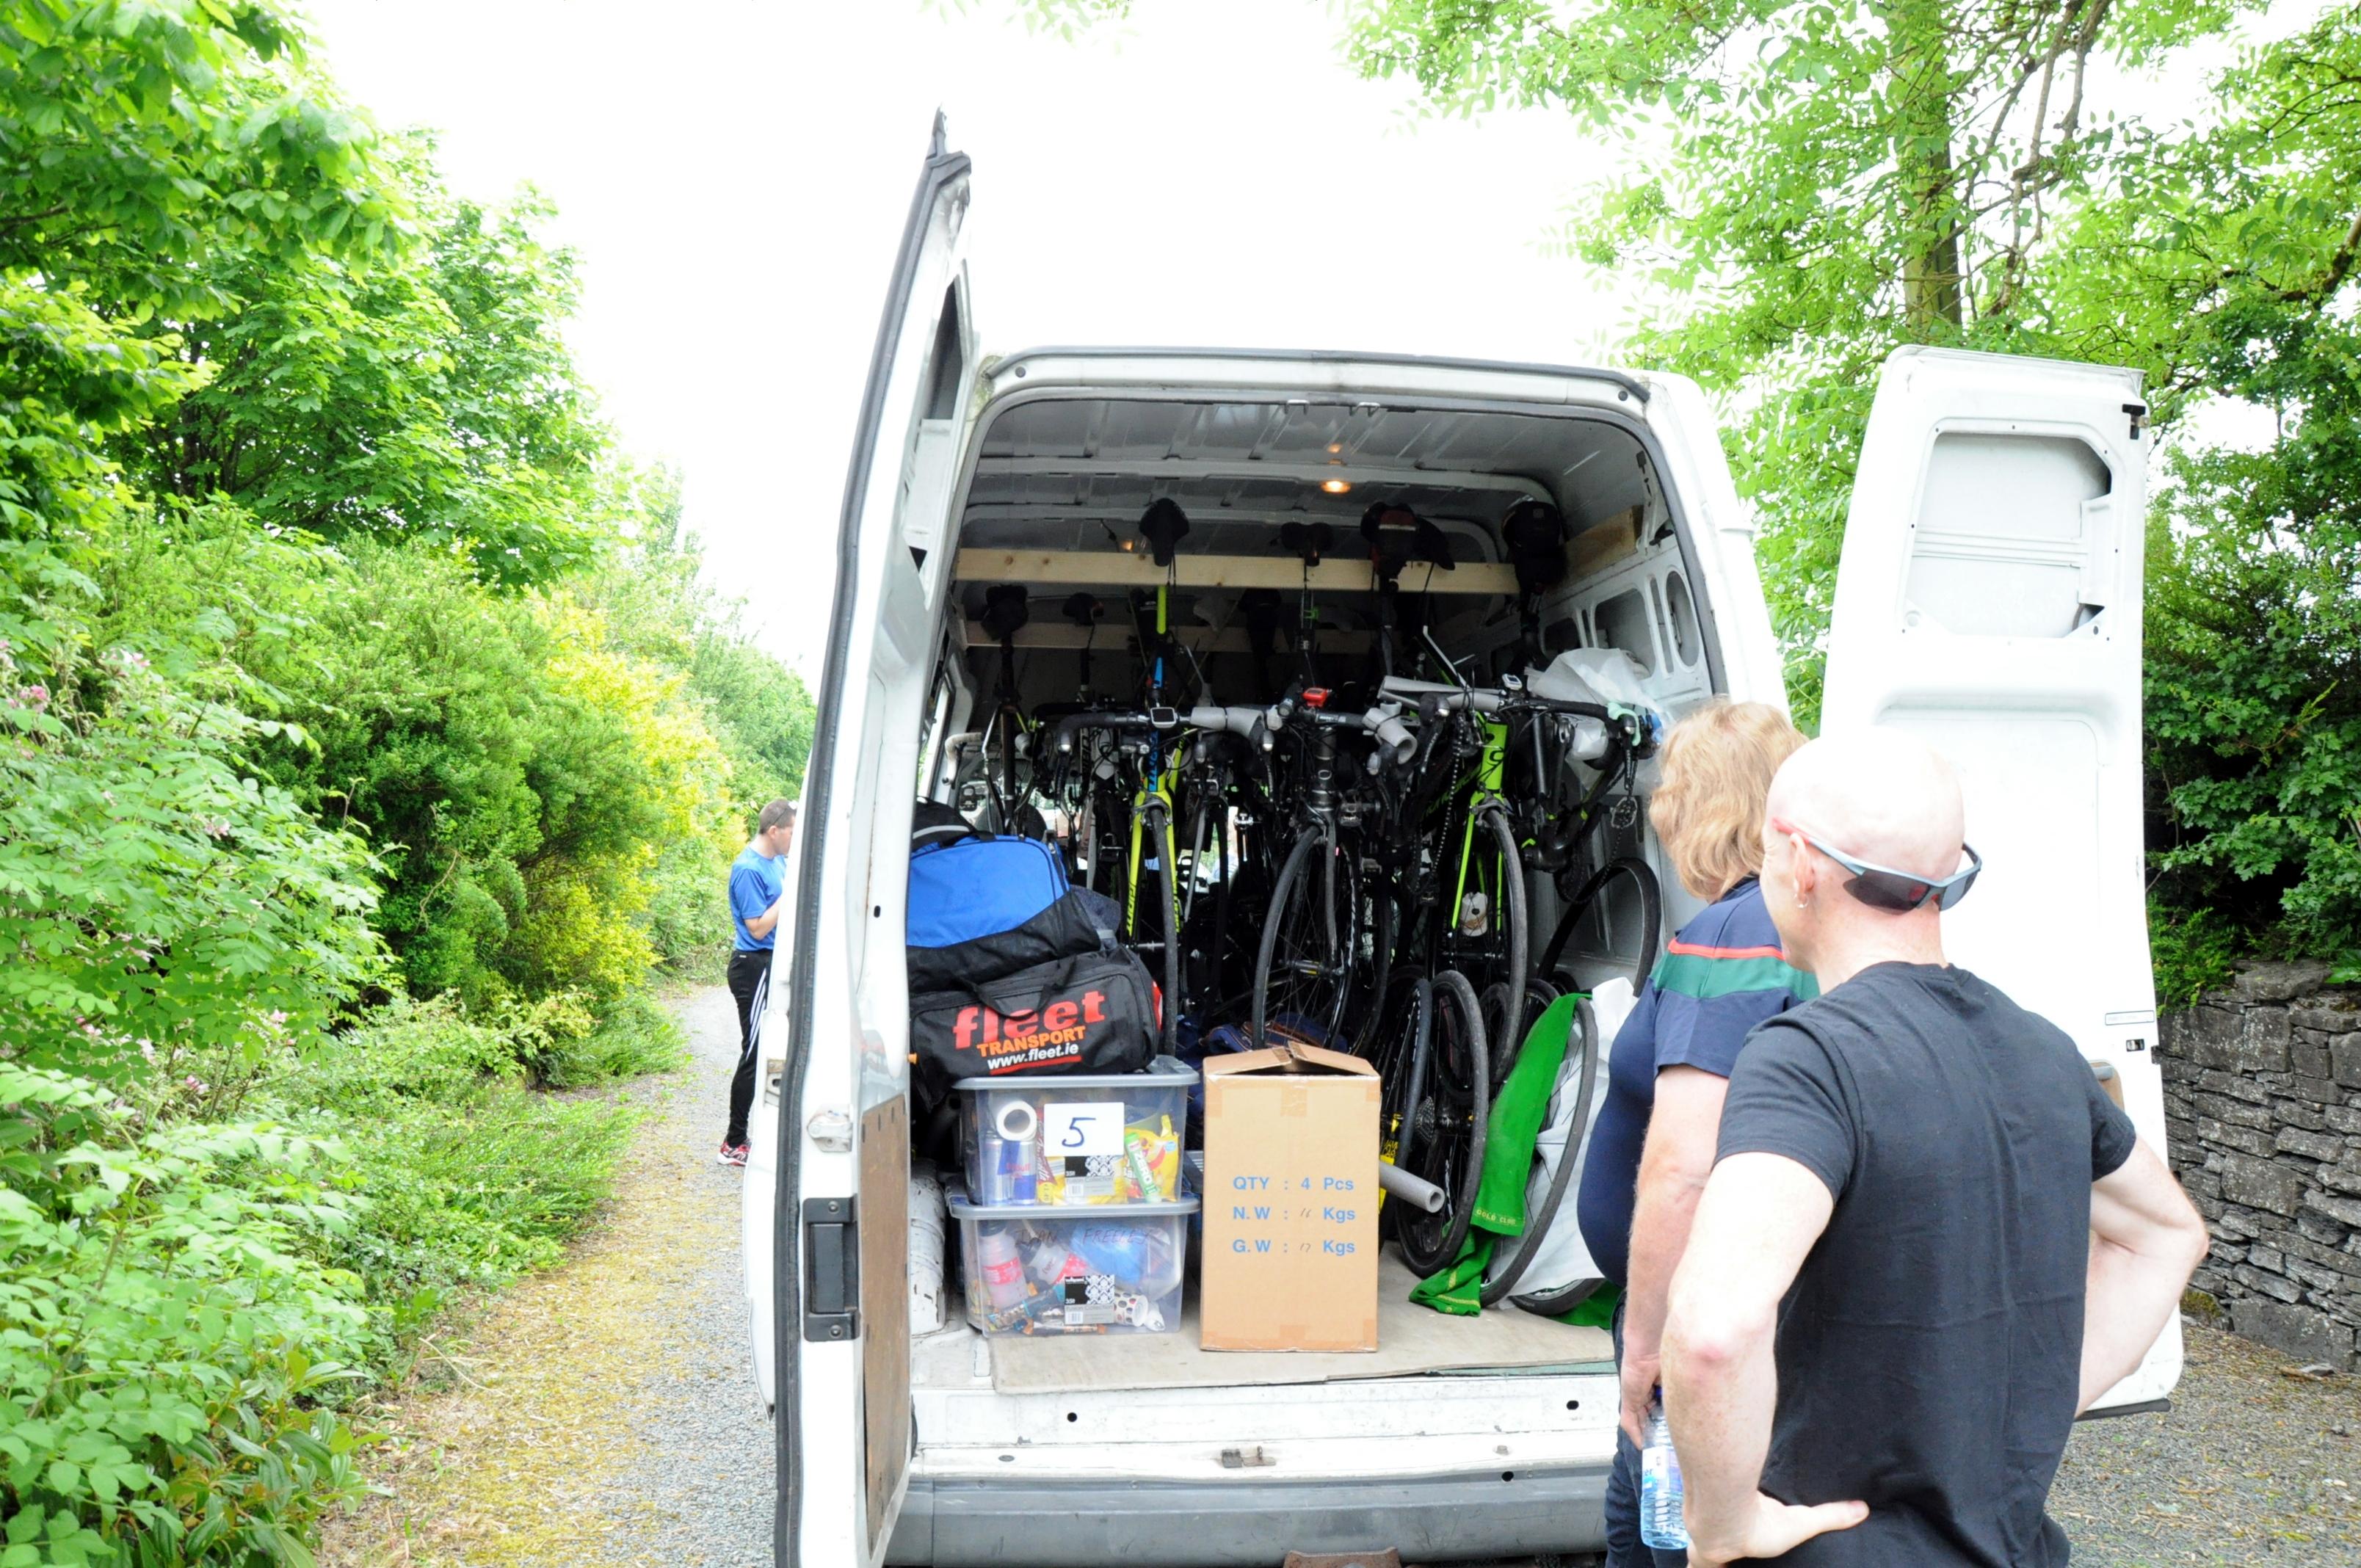 Bike transfer for Mizen to Malin